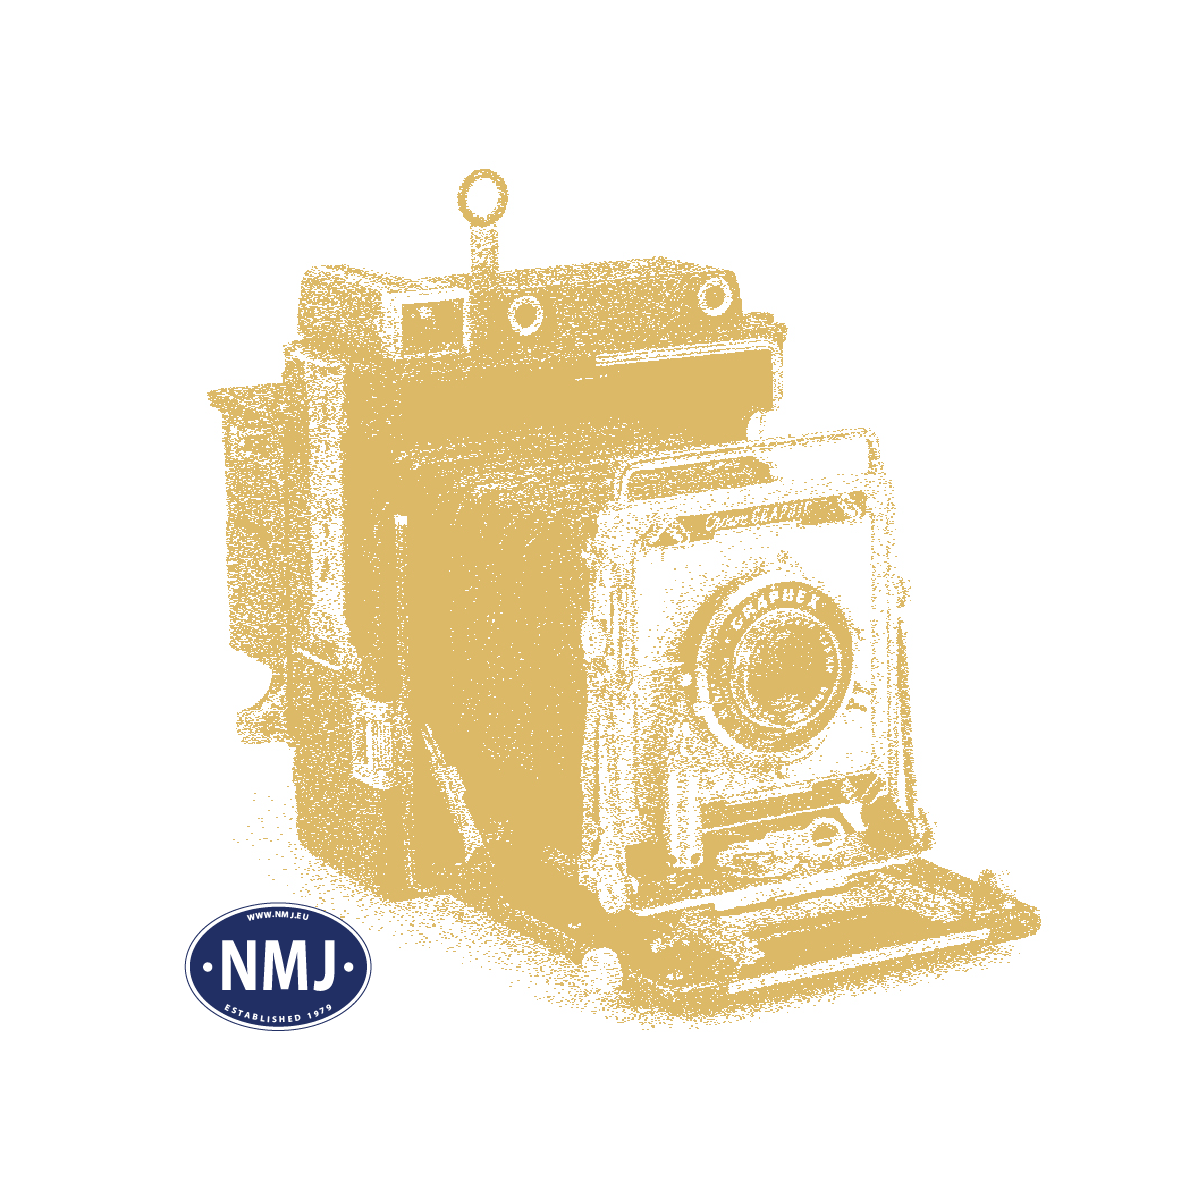 NMJT202.001 - NMJ Topline ABo2.4854 1.2.Kl Personenwagen der SJ, mit altem SJ Logo